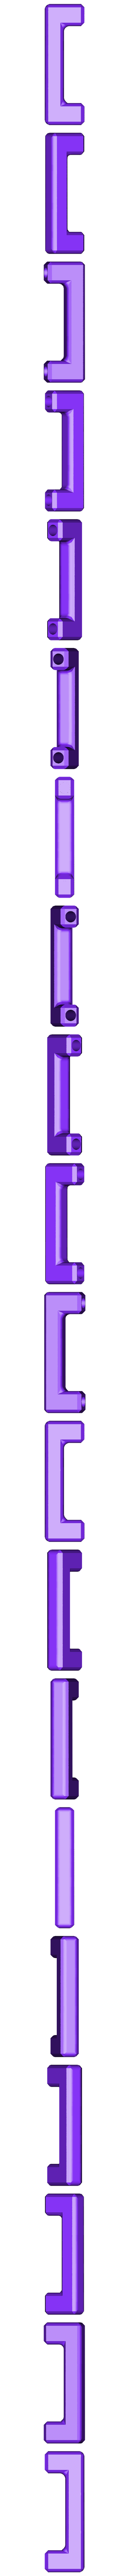 handle.stl Download free STL file Wheelie tote box kit • Model to 3D print, Sagittario